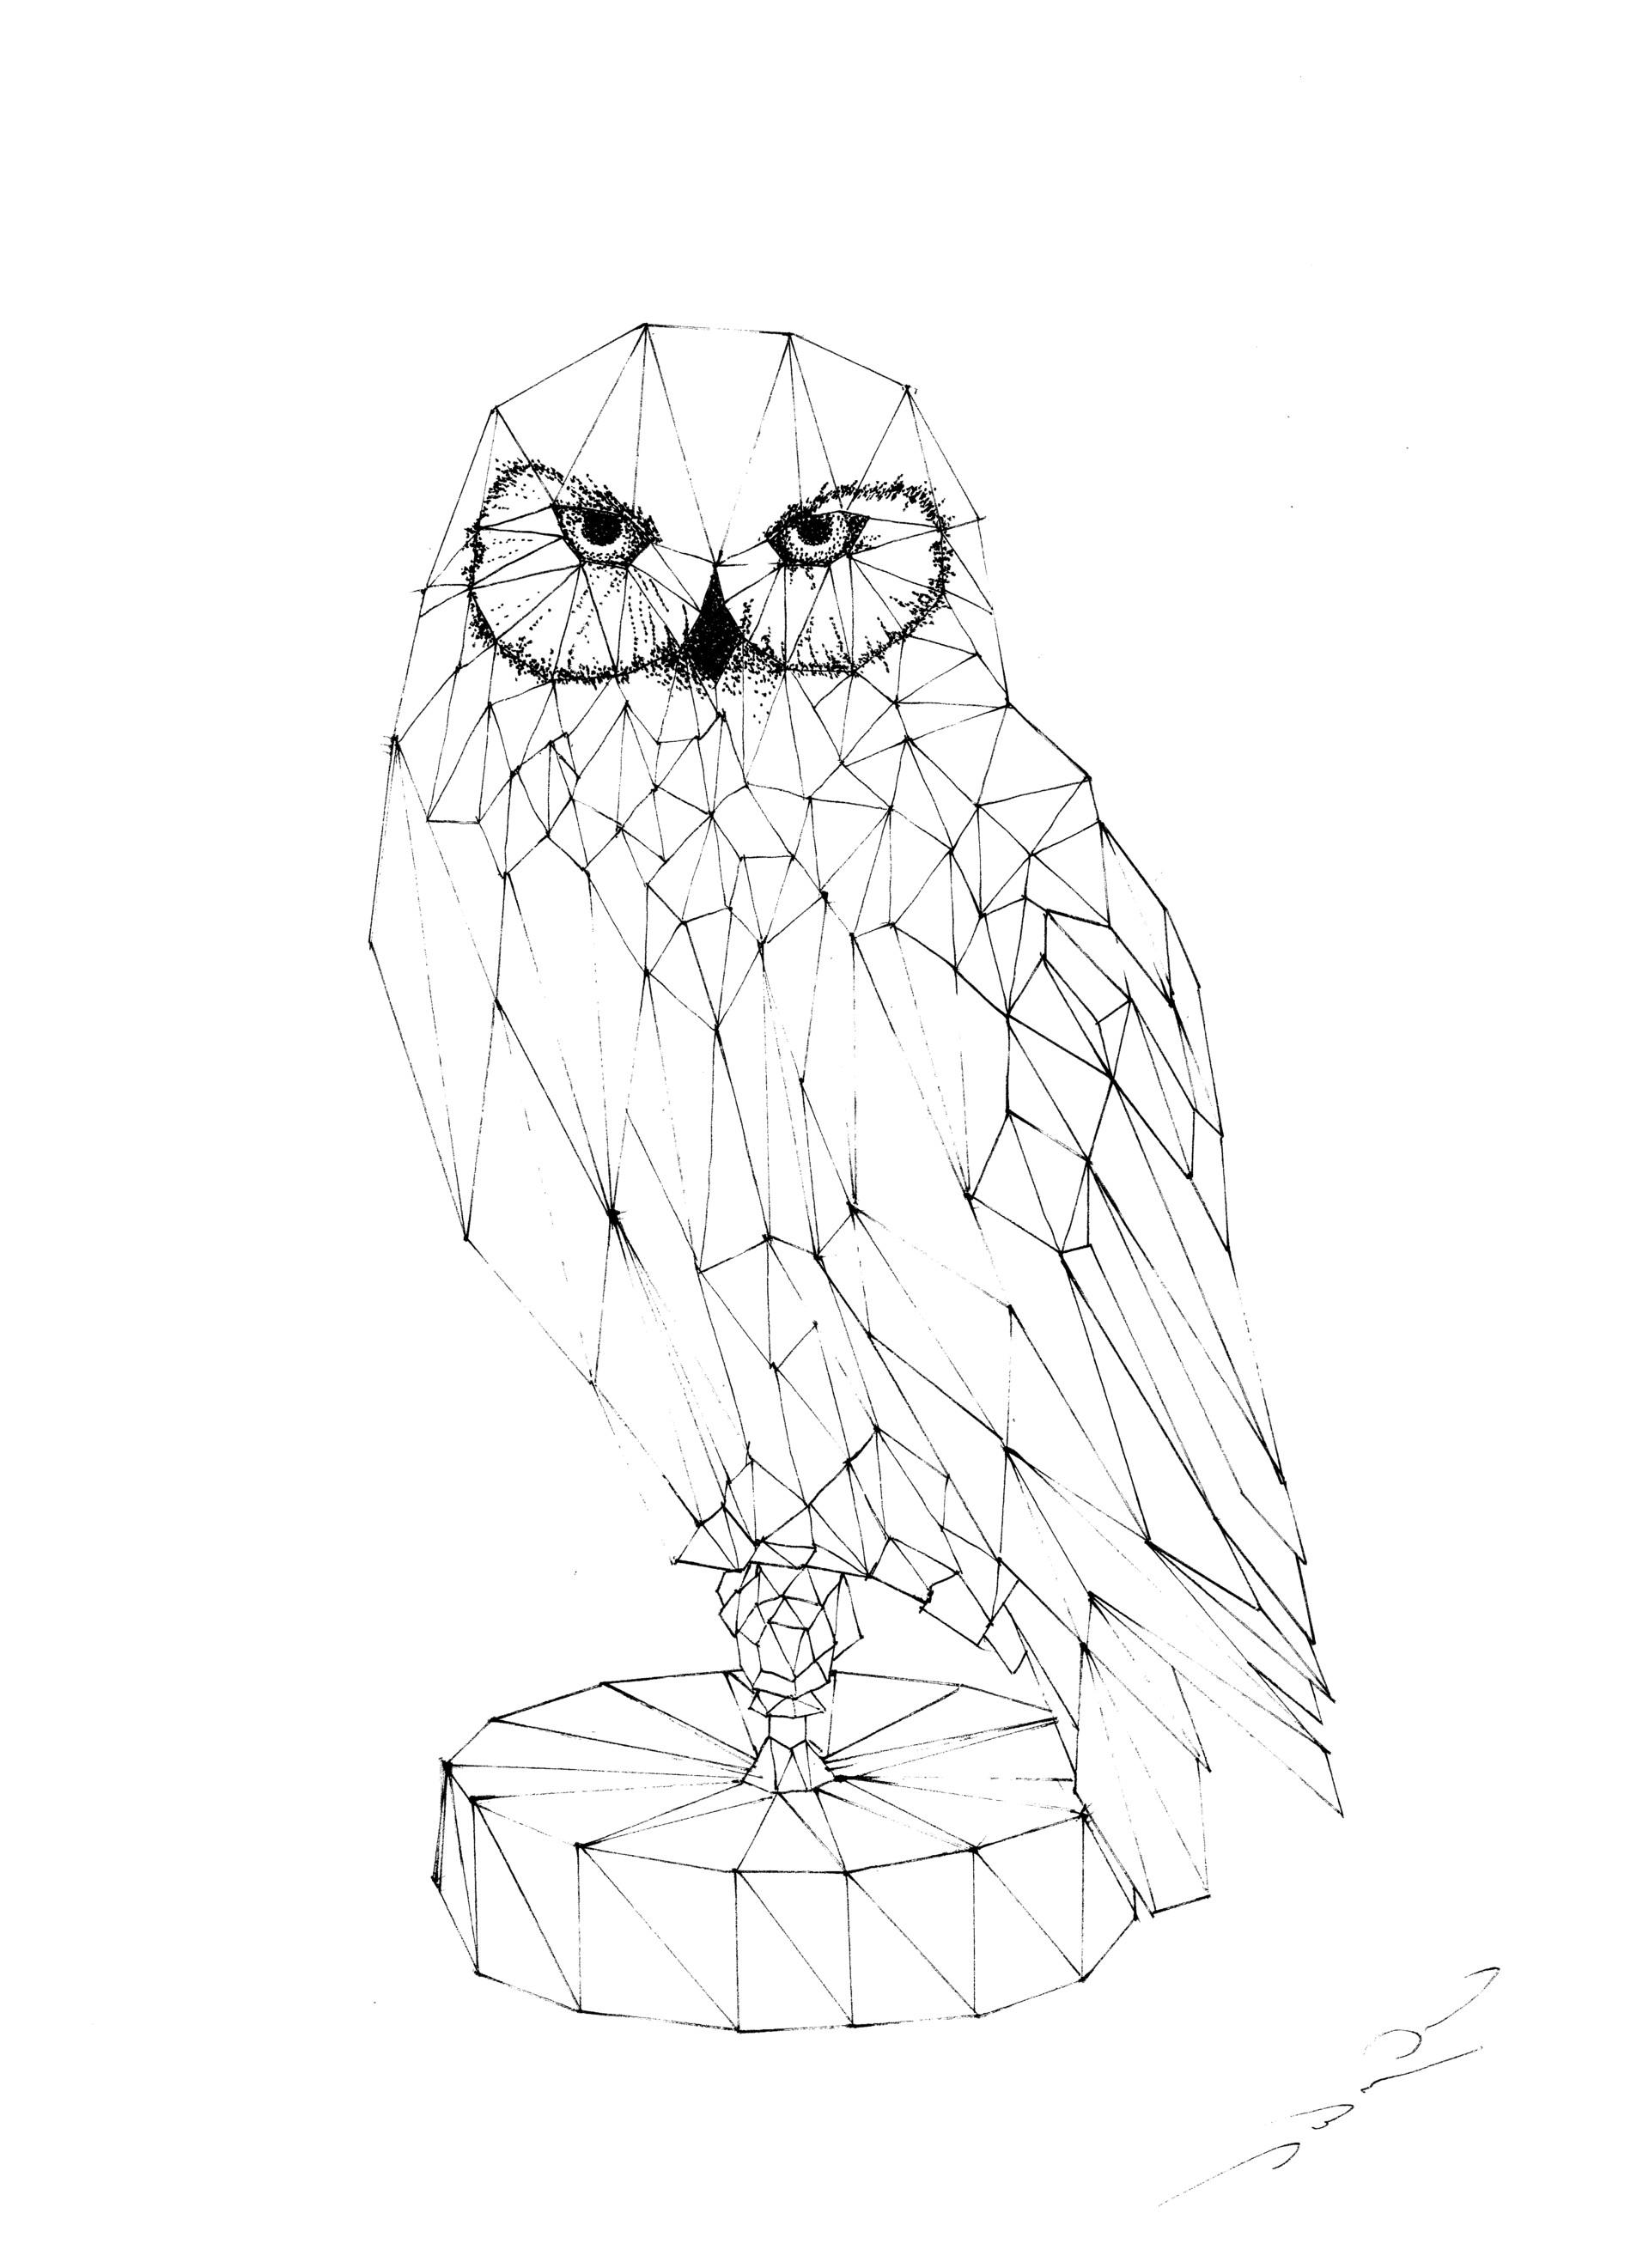 kelvin paul marchioro hand drawings techniques